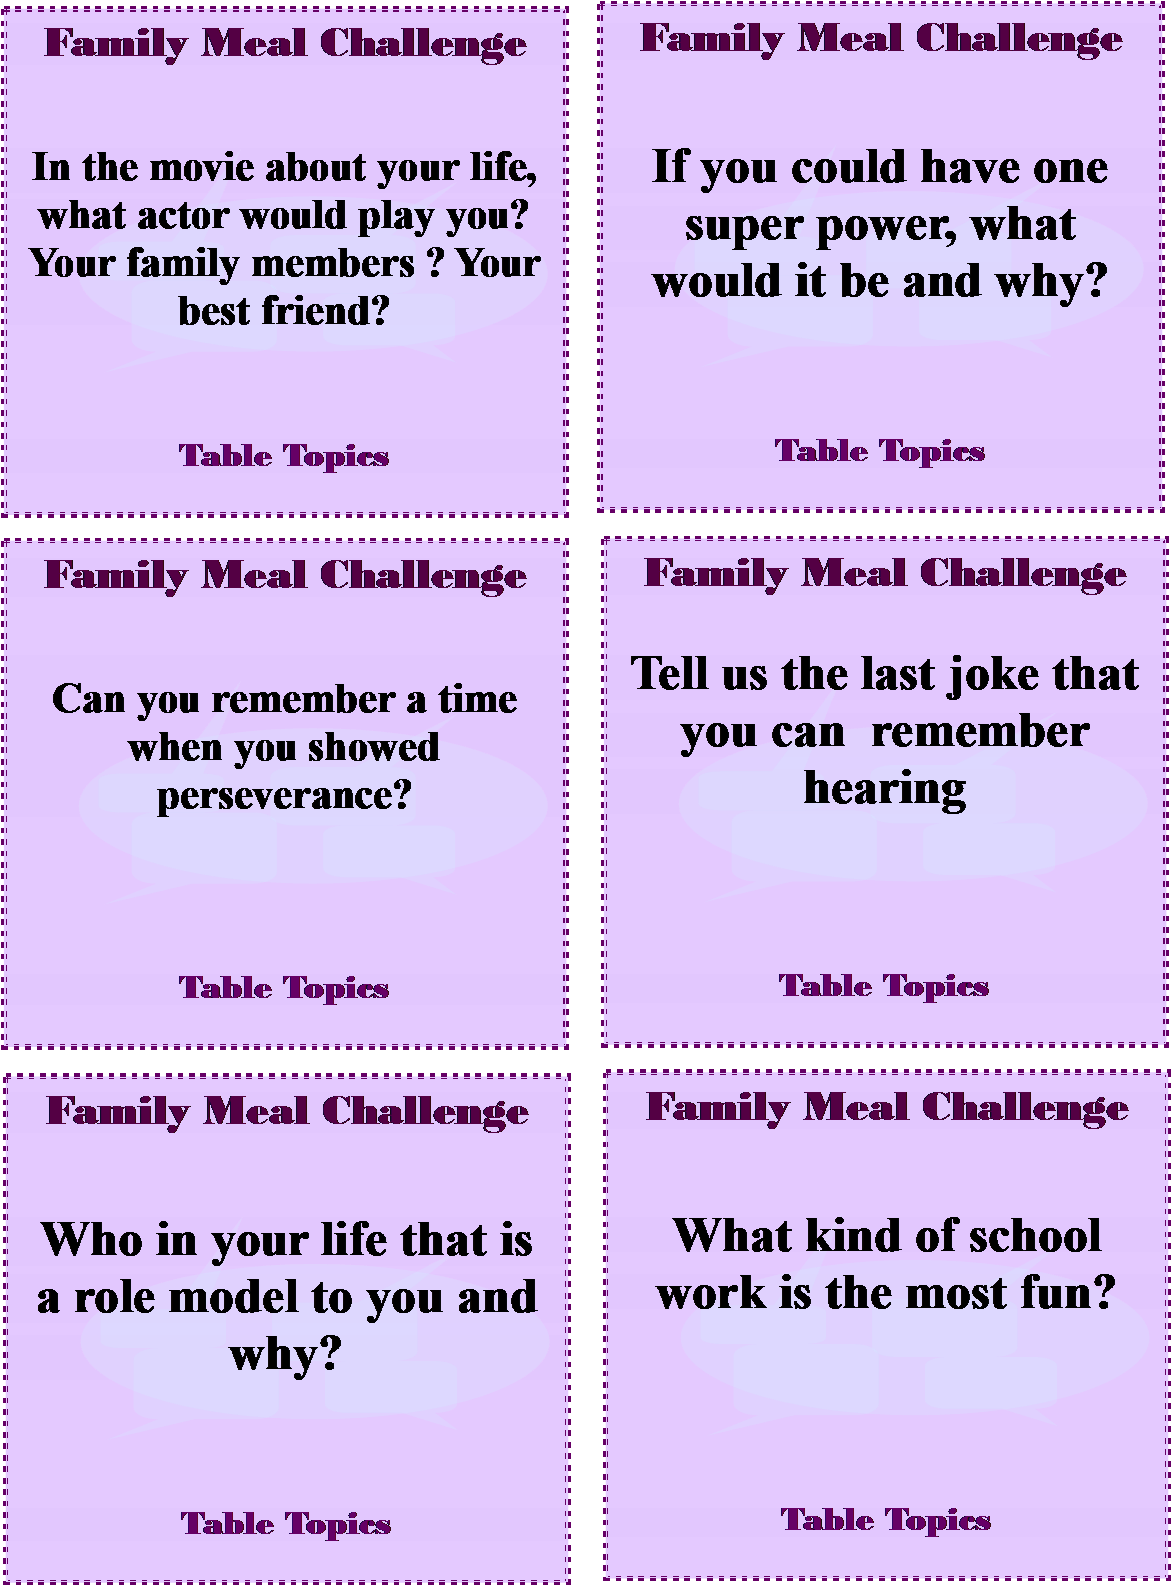 Table topics questions resolutions